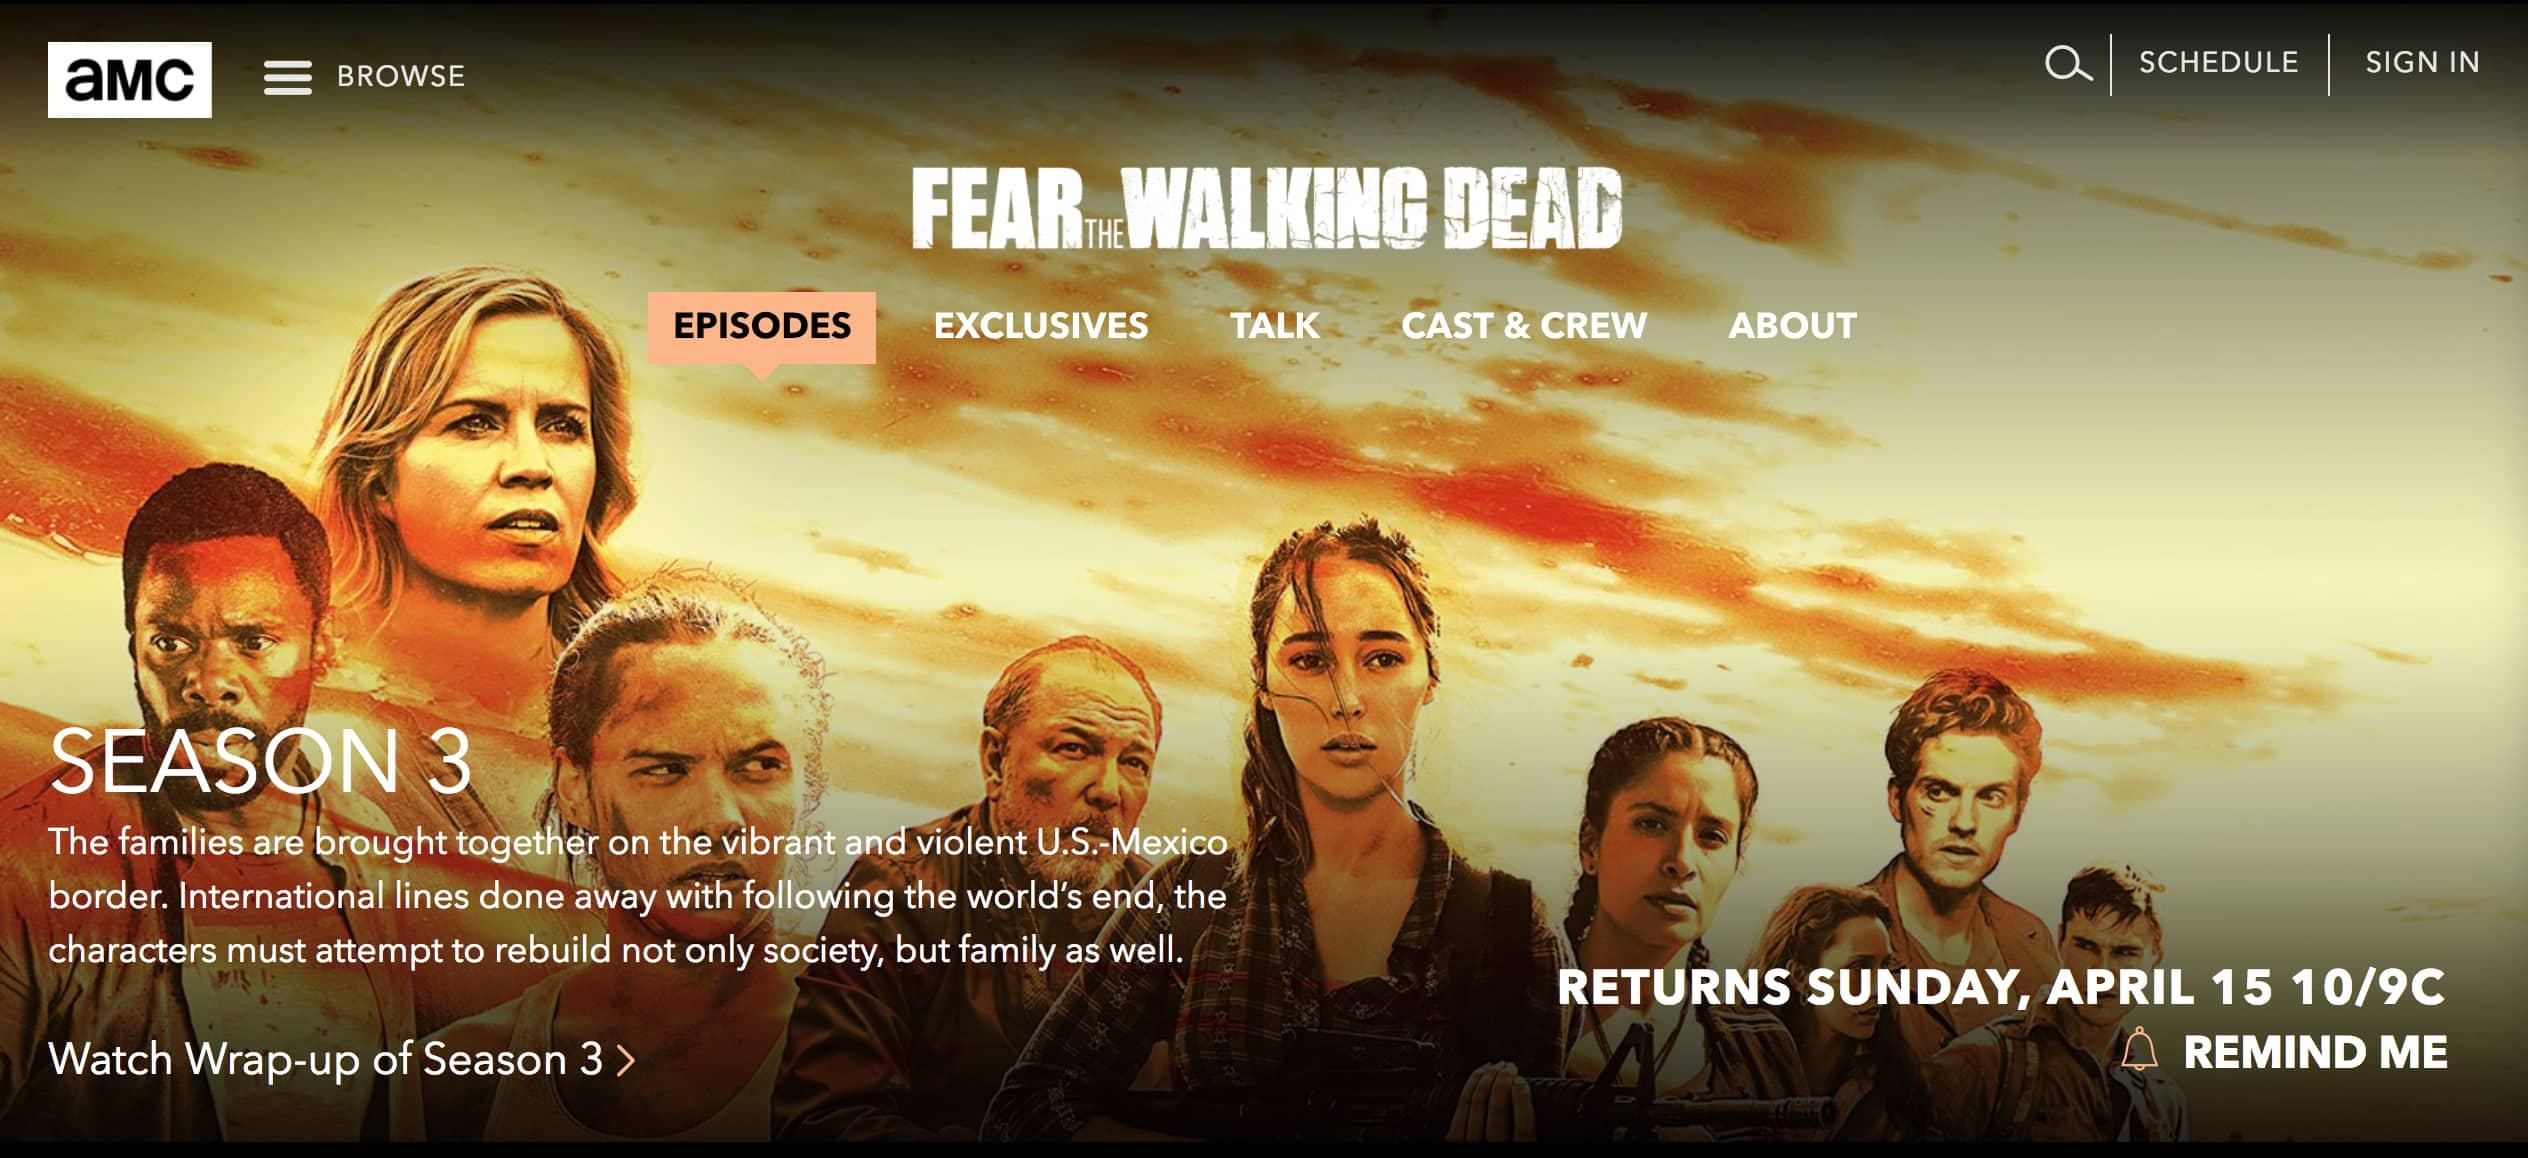 Fear The Walking Dead Spinoff AMC